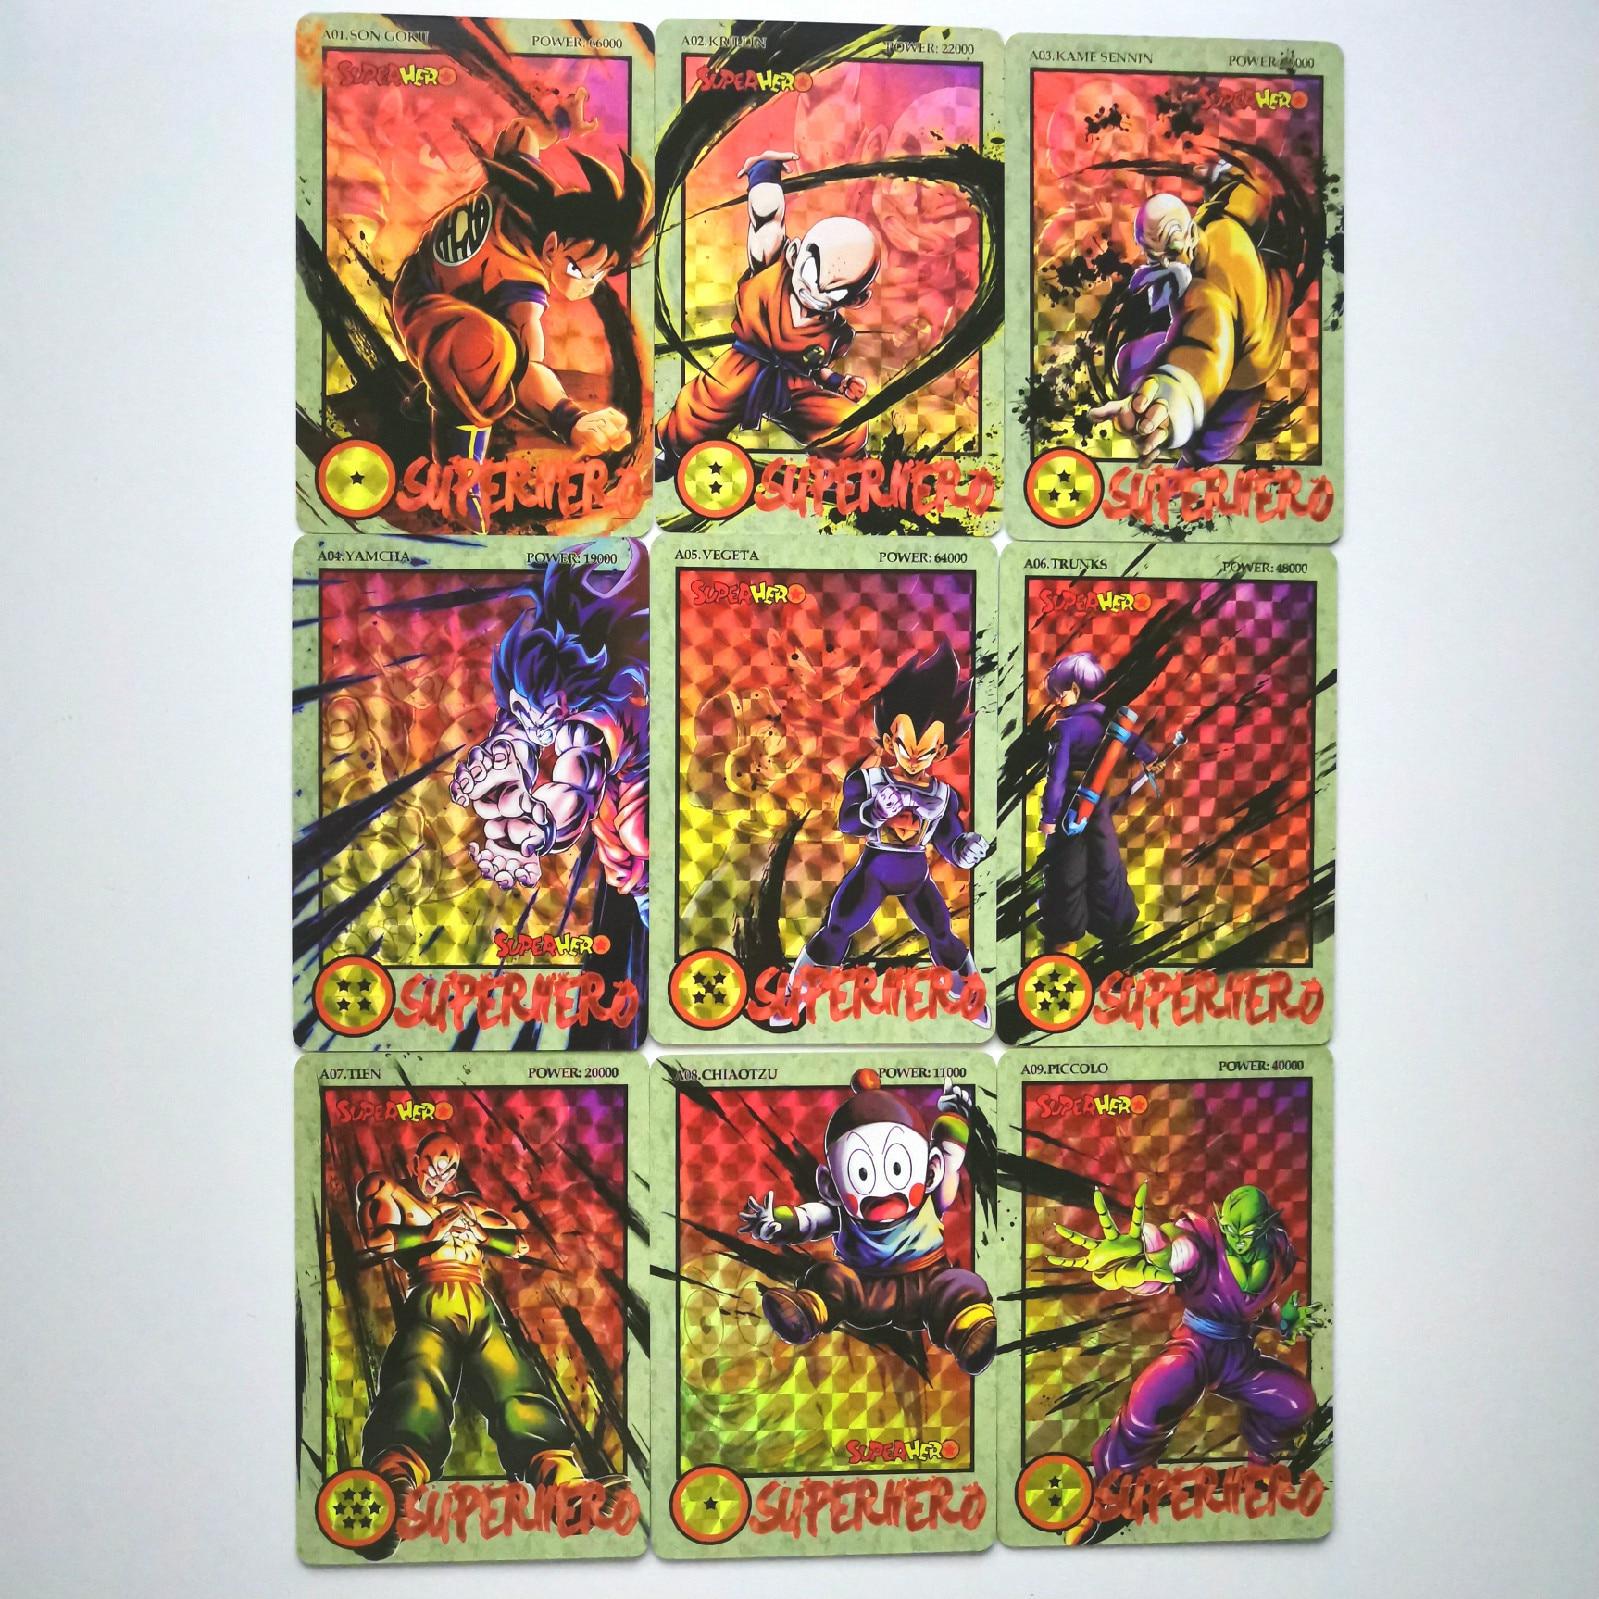 36pcs Super Dragon Ball Z Ink Relief Heroes Battle Card Ultra Instinct Goku Vegeta Super Game Collection Cards